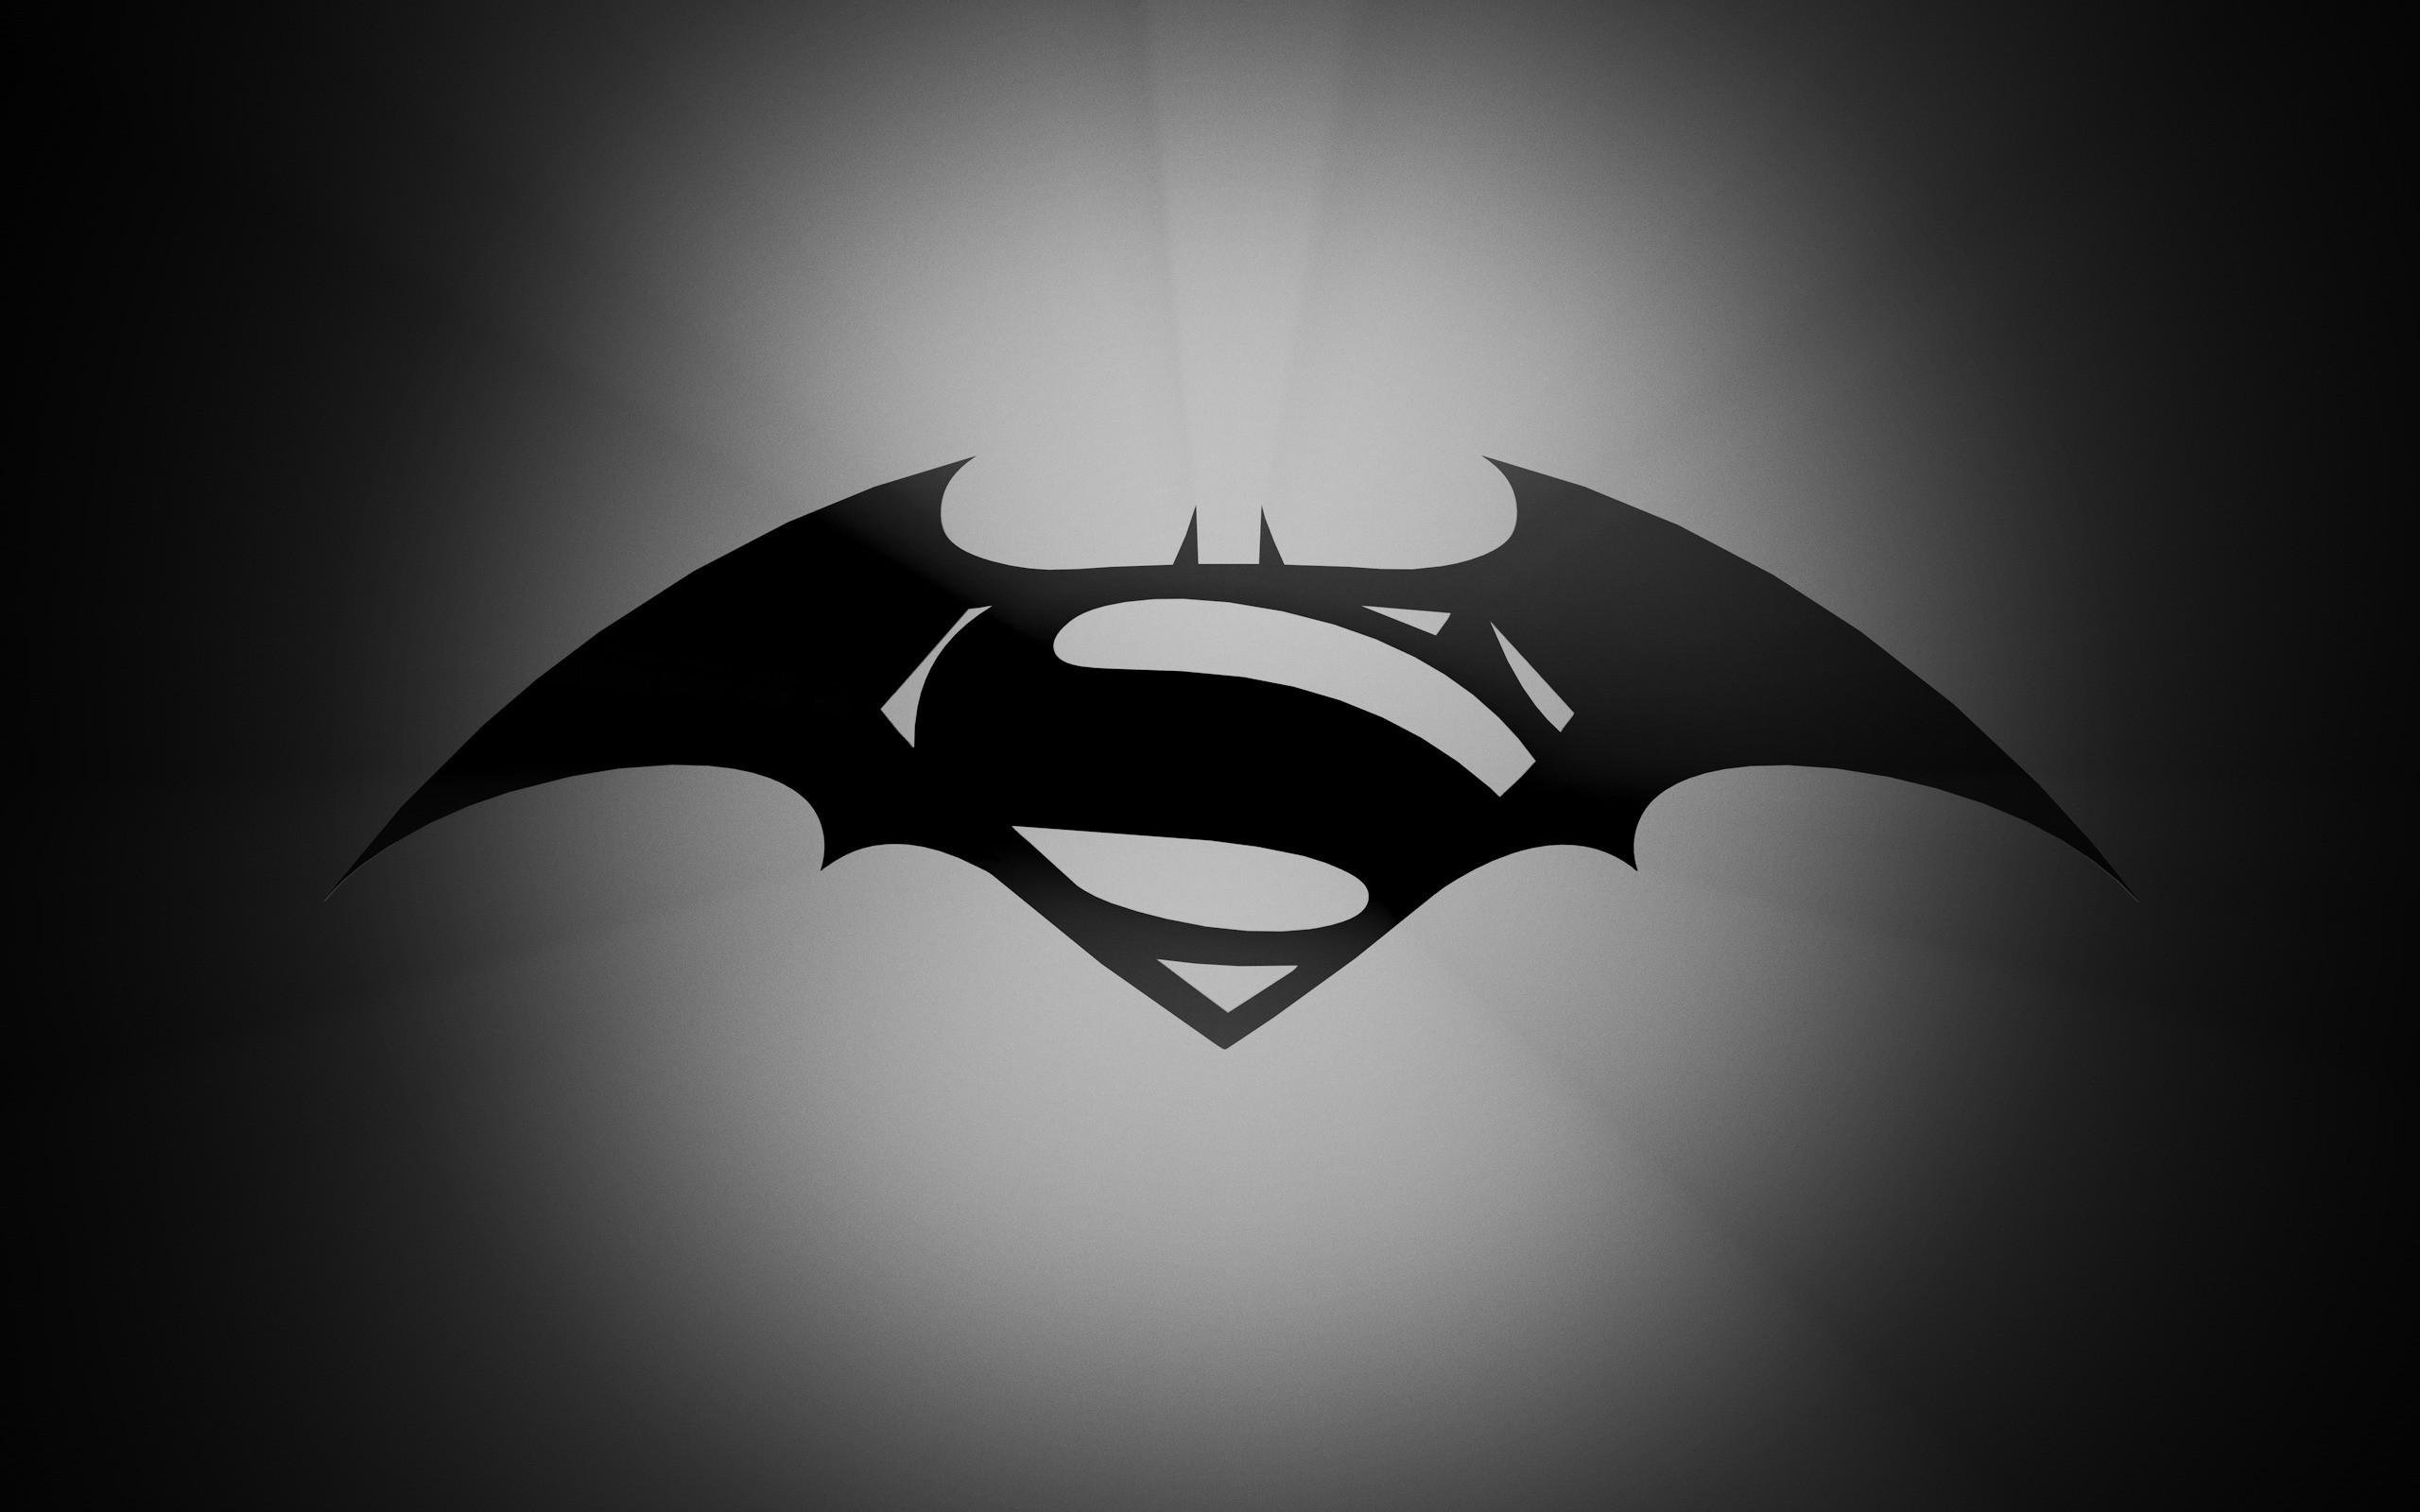 Superman Batman Wallpapers – Full HD Wallpaper Search